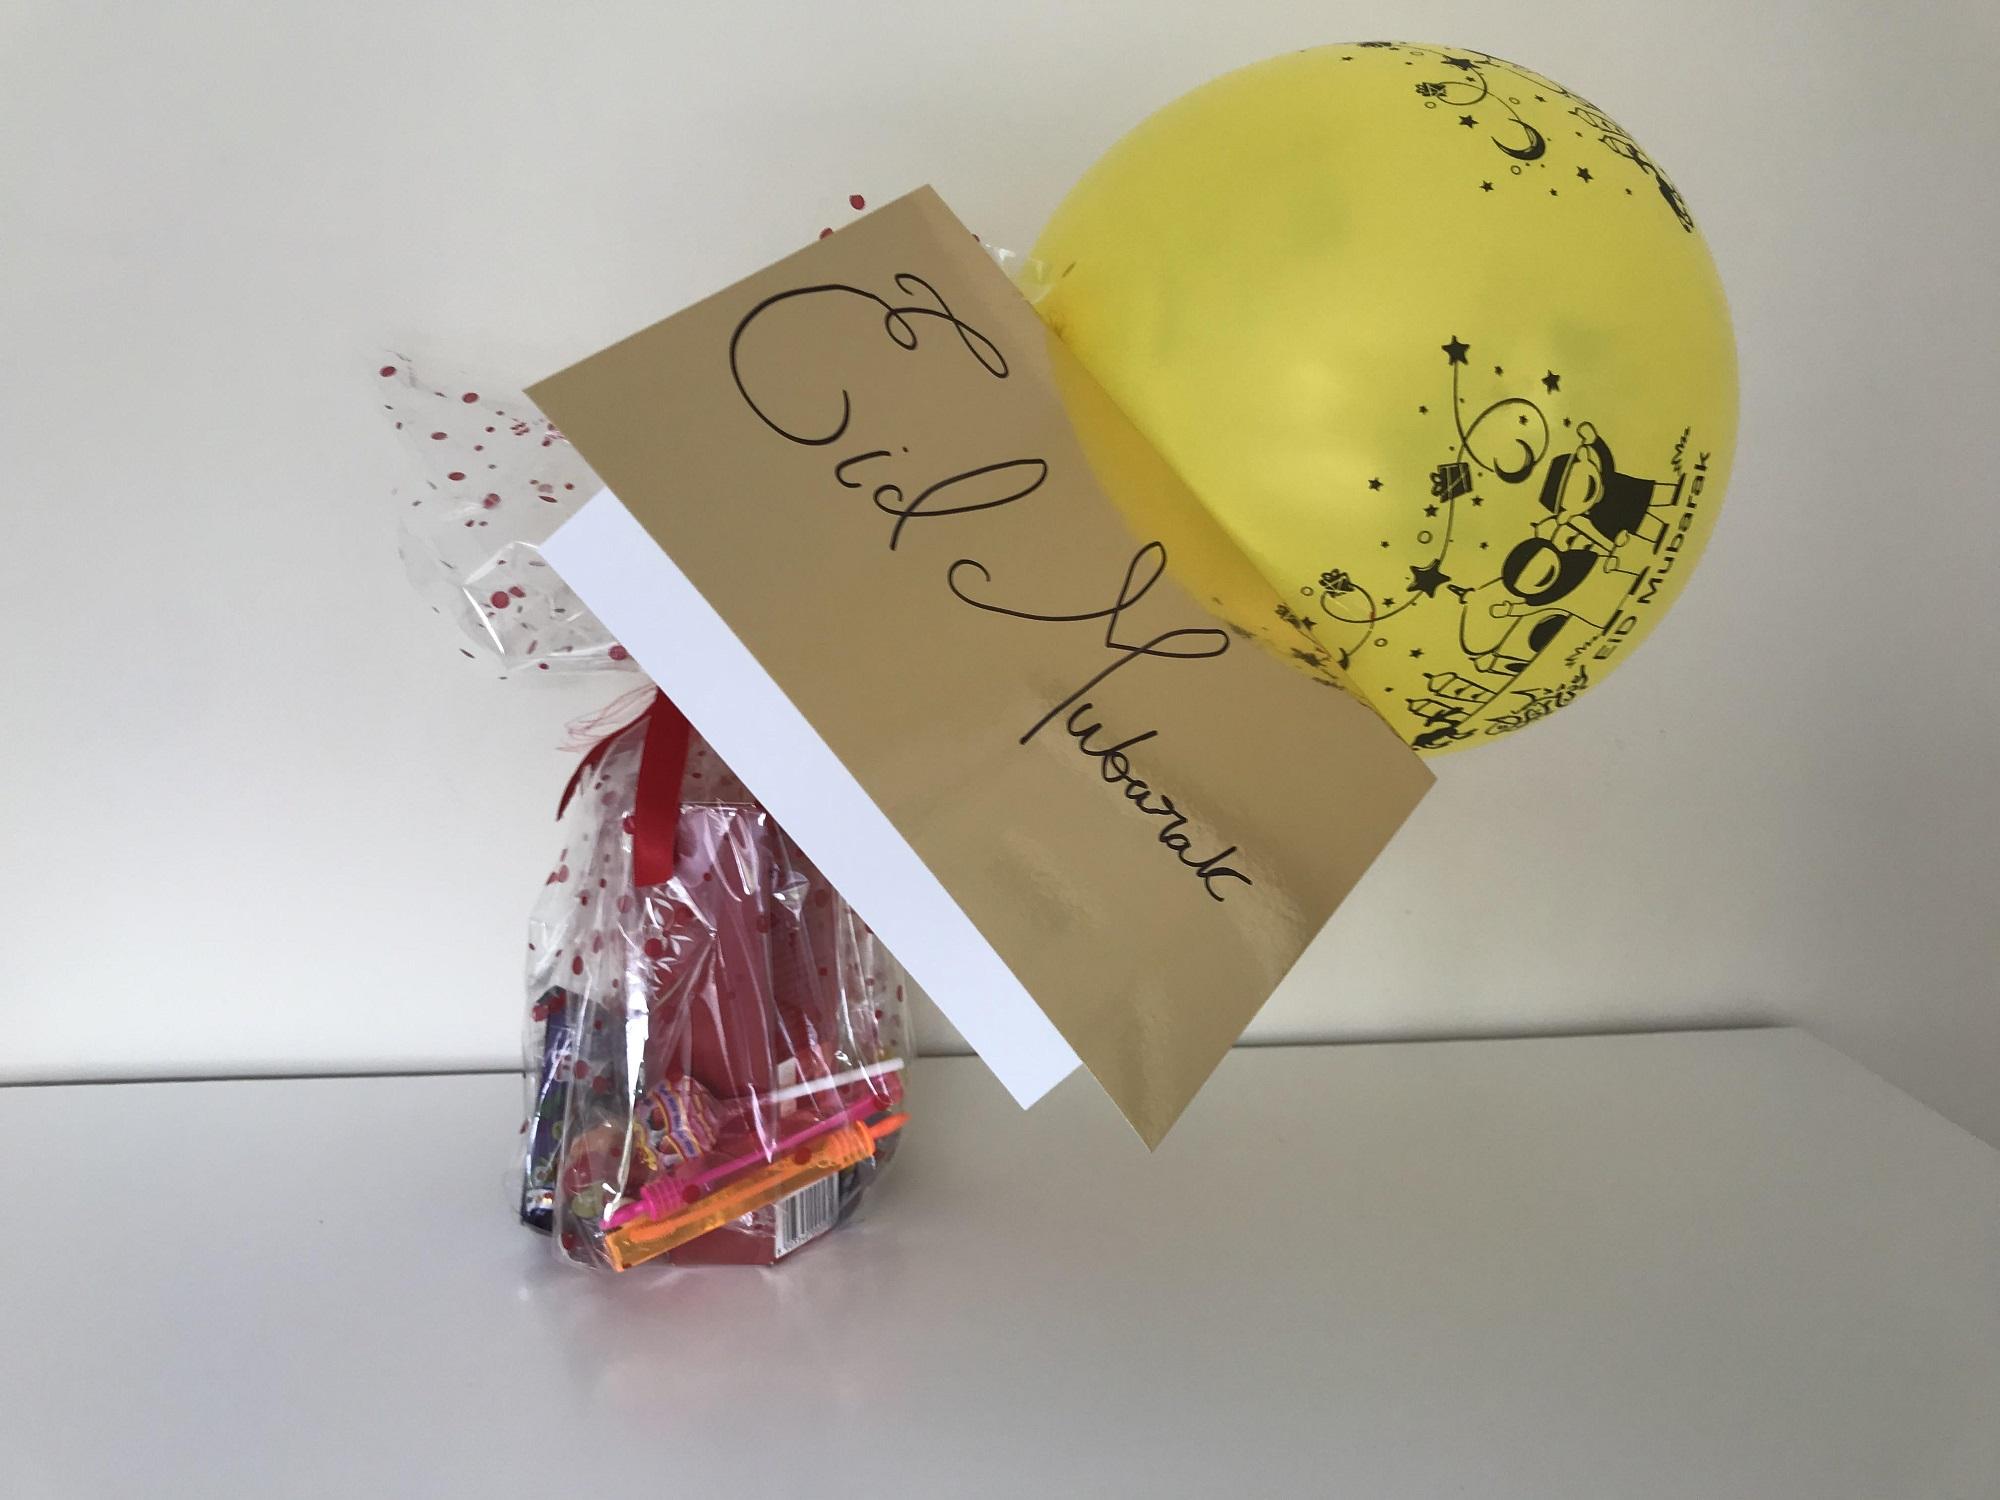 A card and balloon